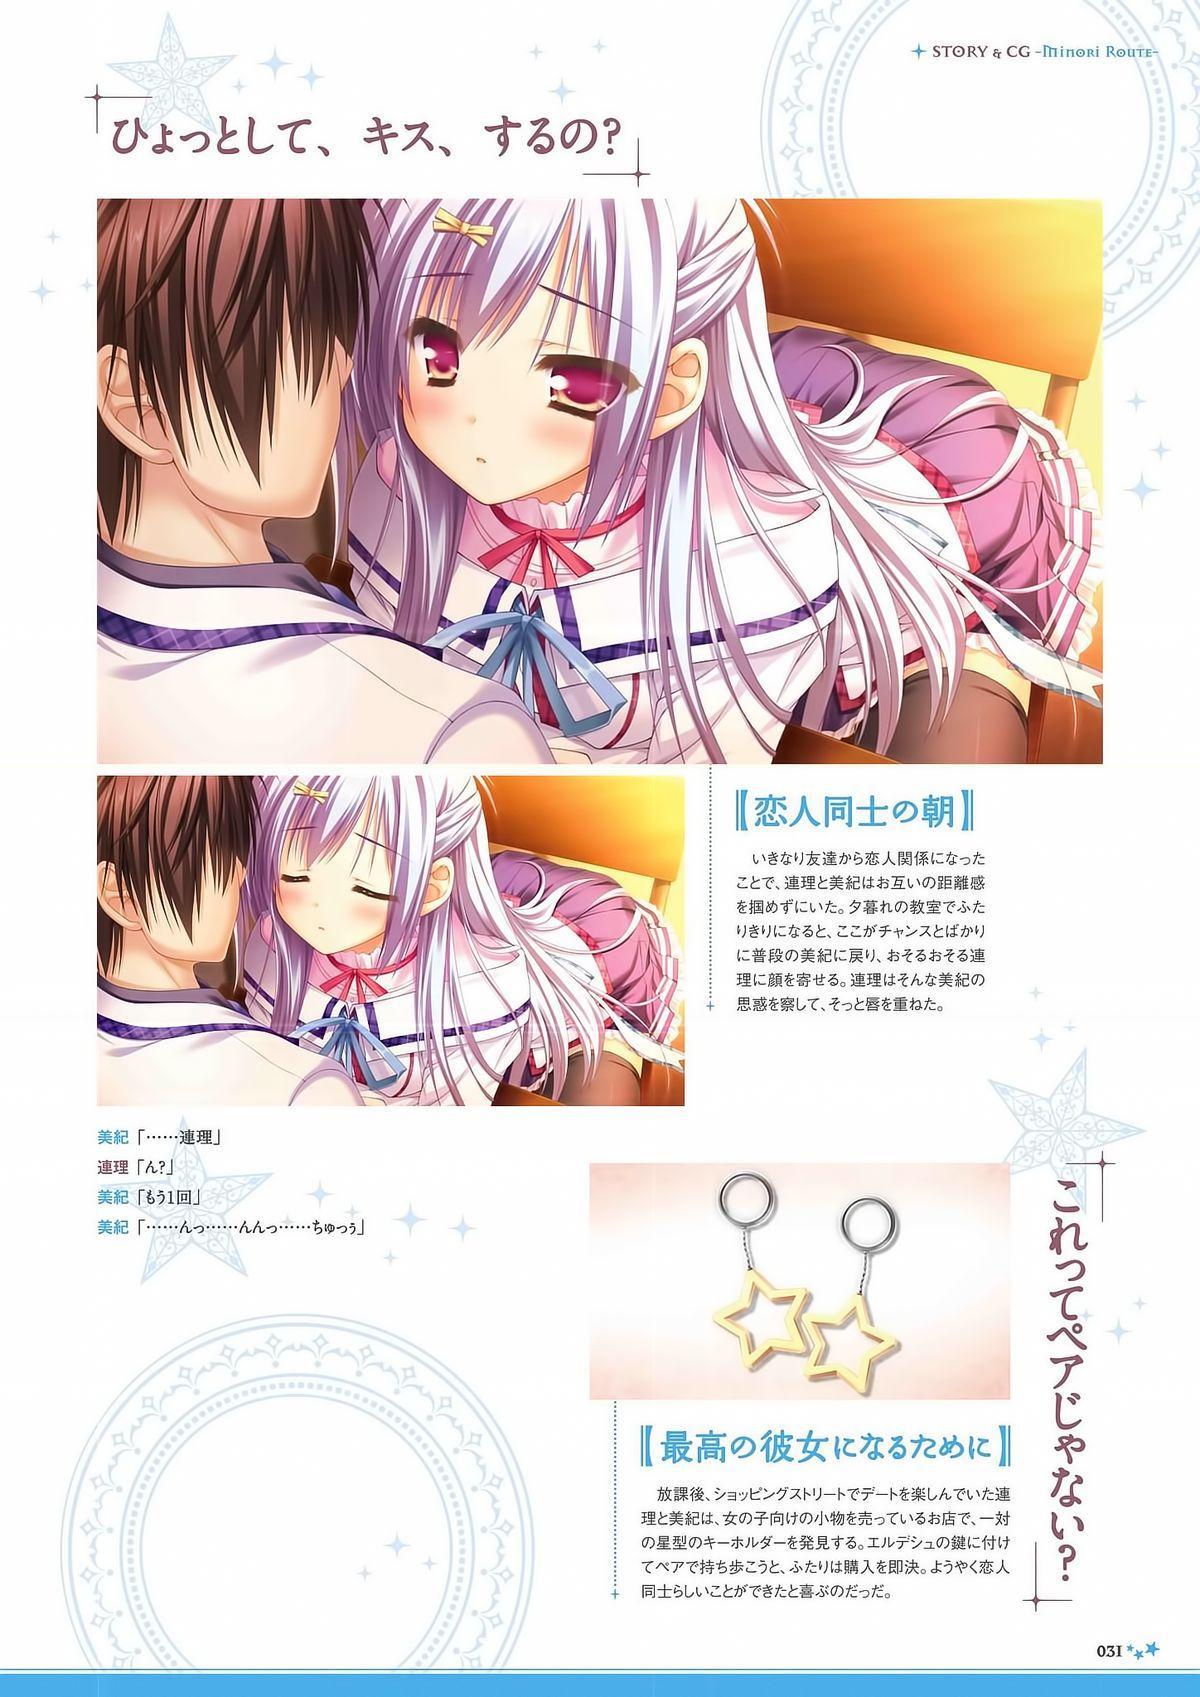 Sekai to Sekai no Mannaka de Visual Fanbook 32